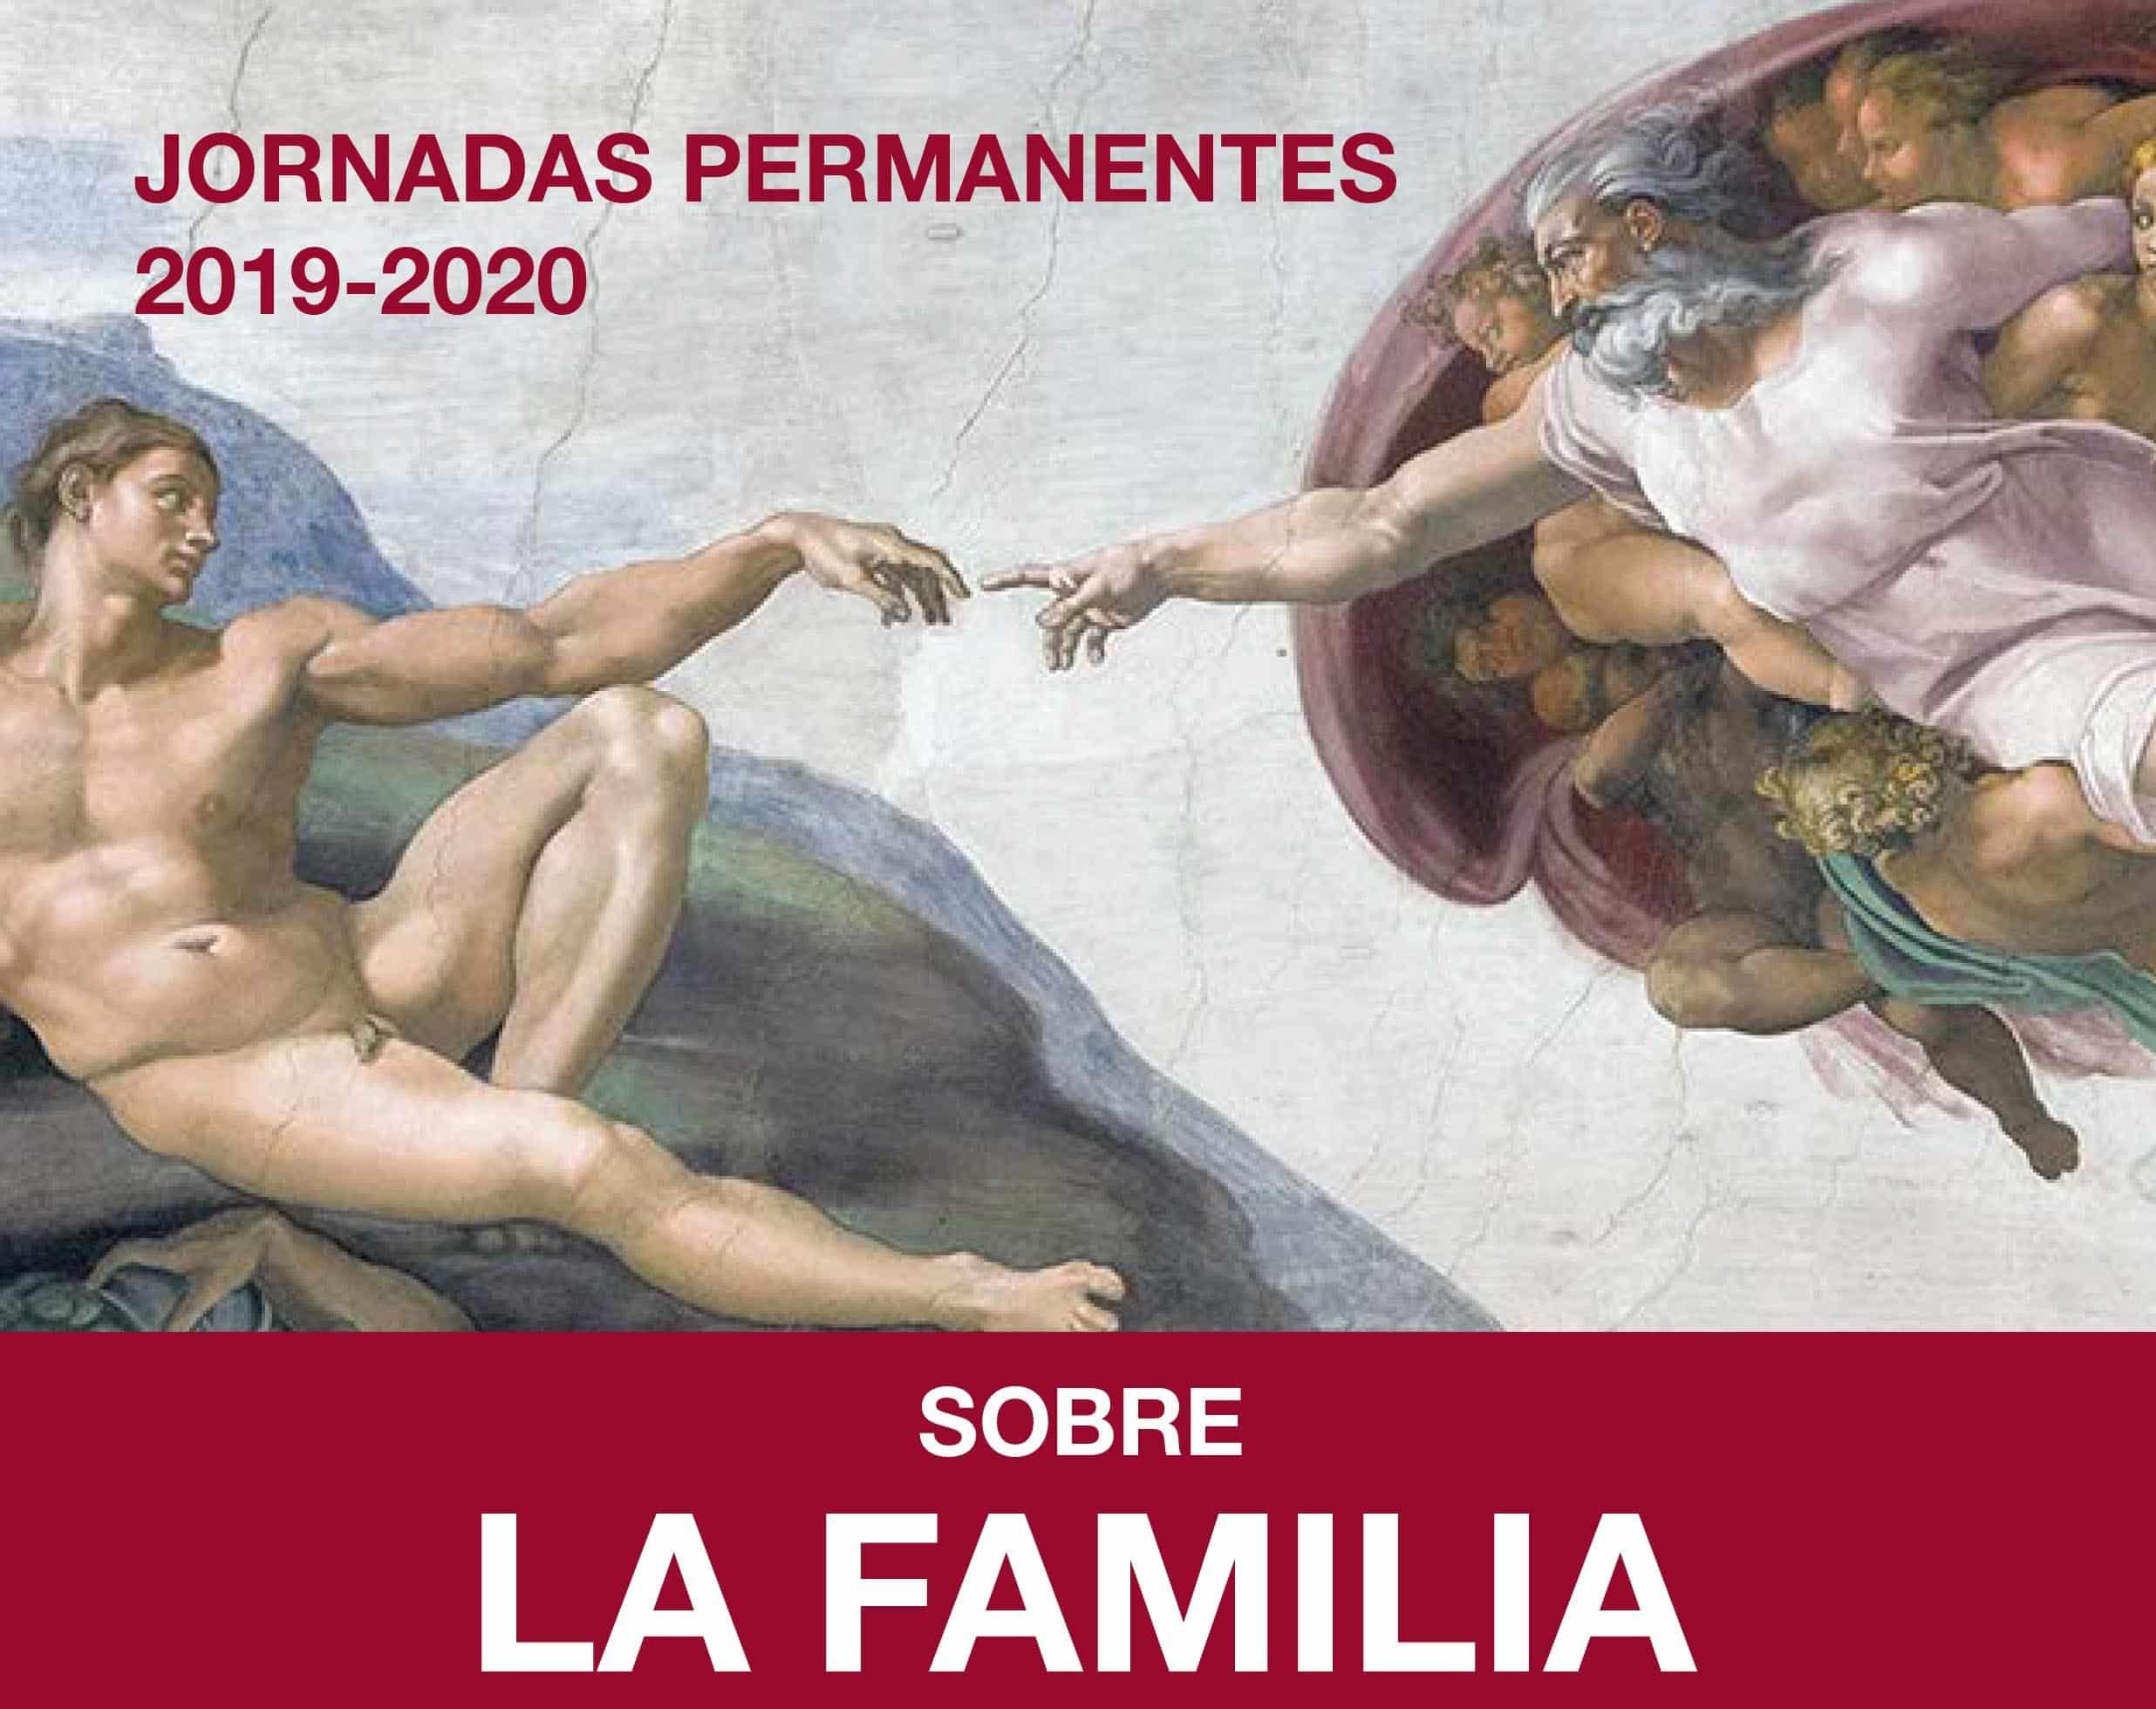 JORNADAS PERMANENTES sobre la Familia 2019-2020